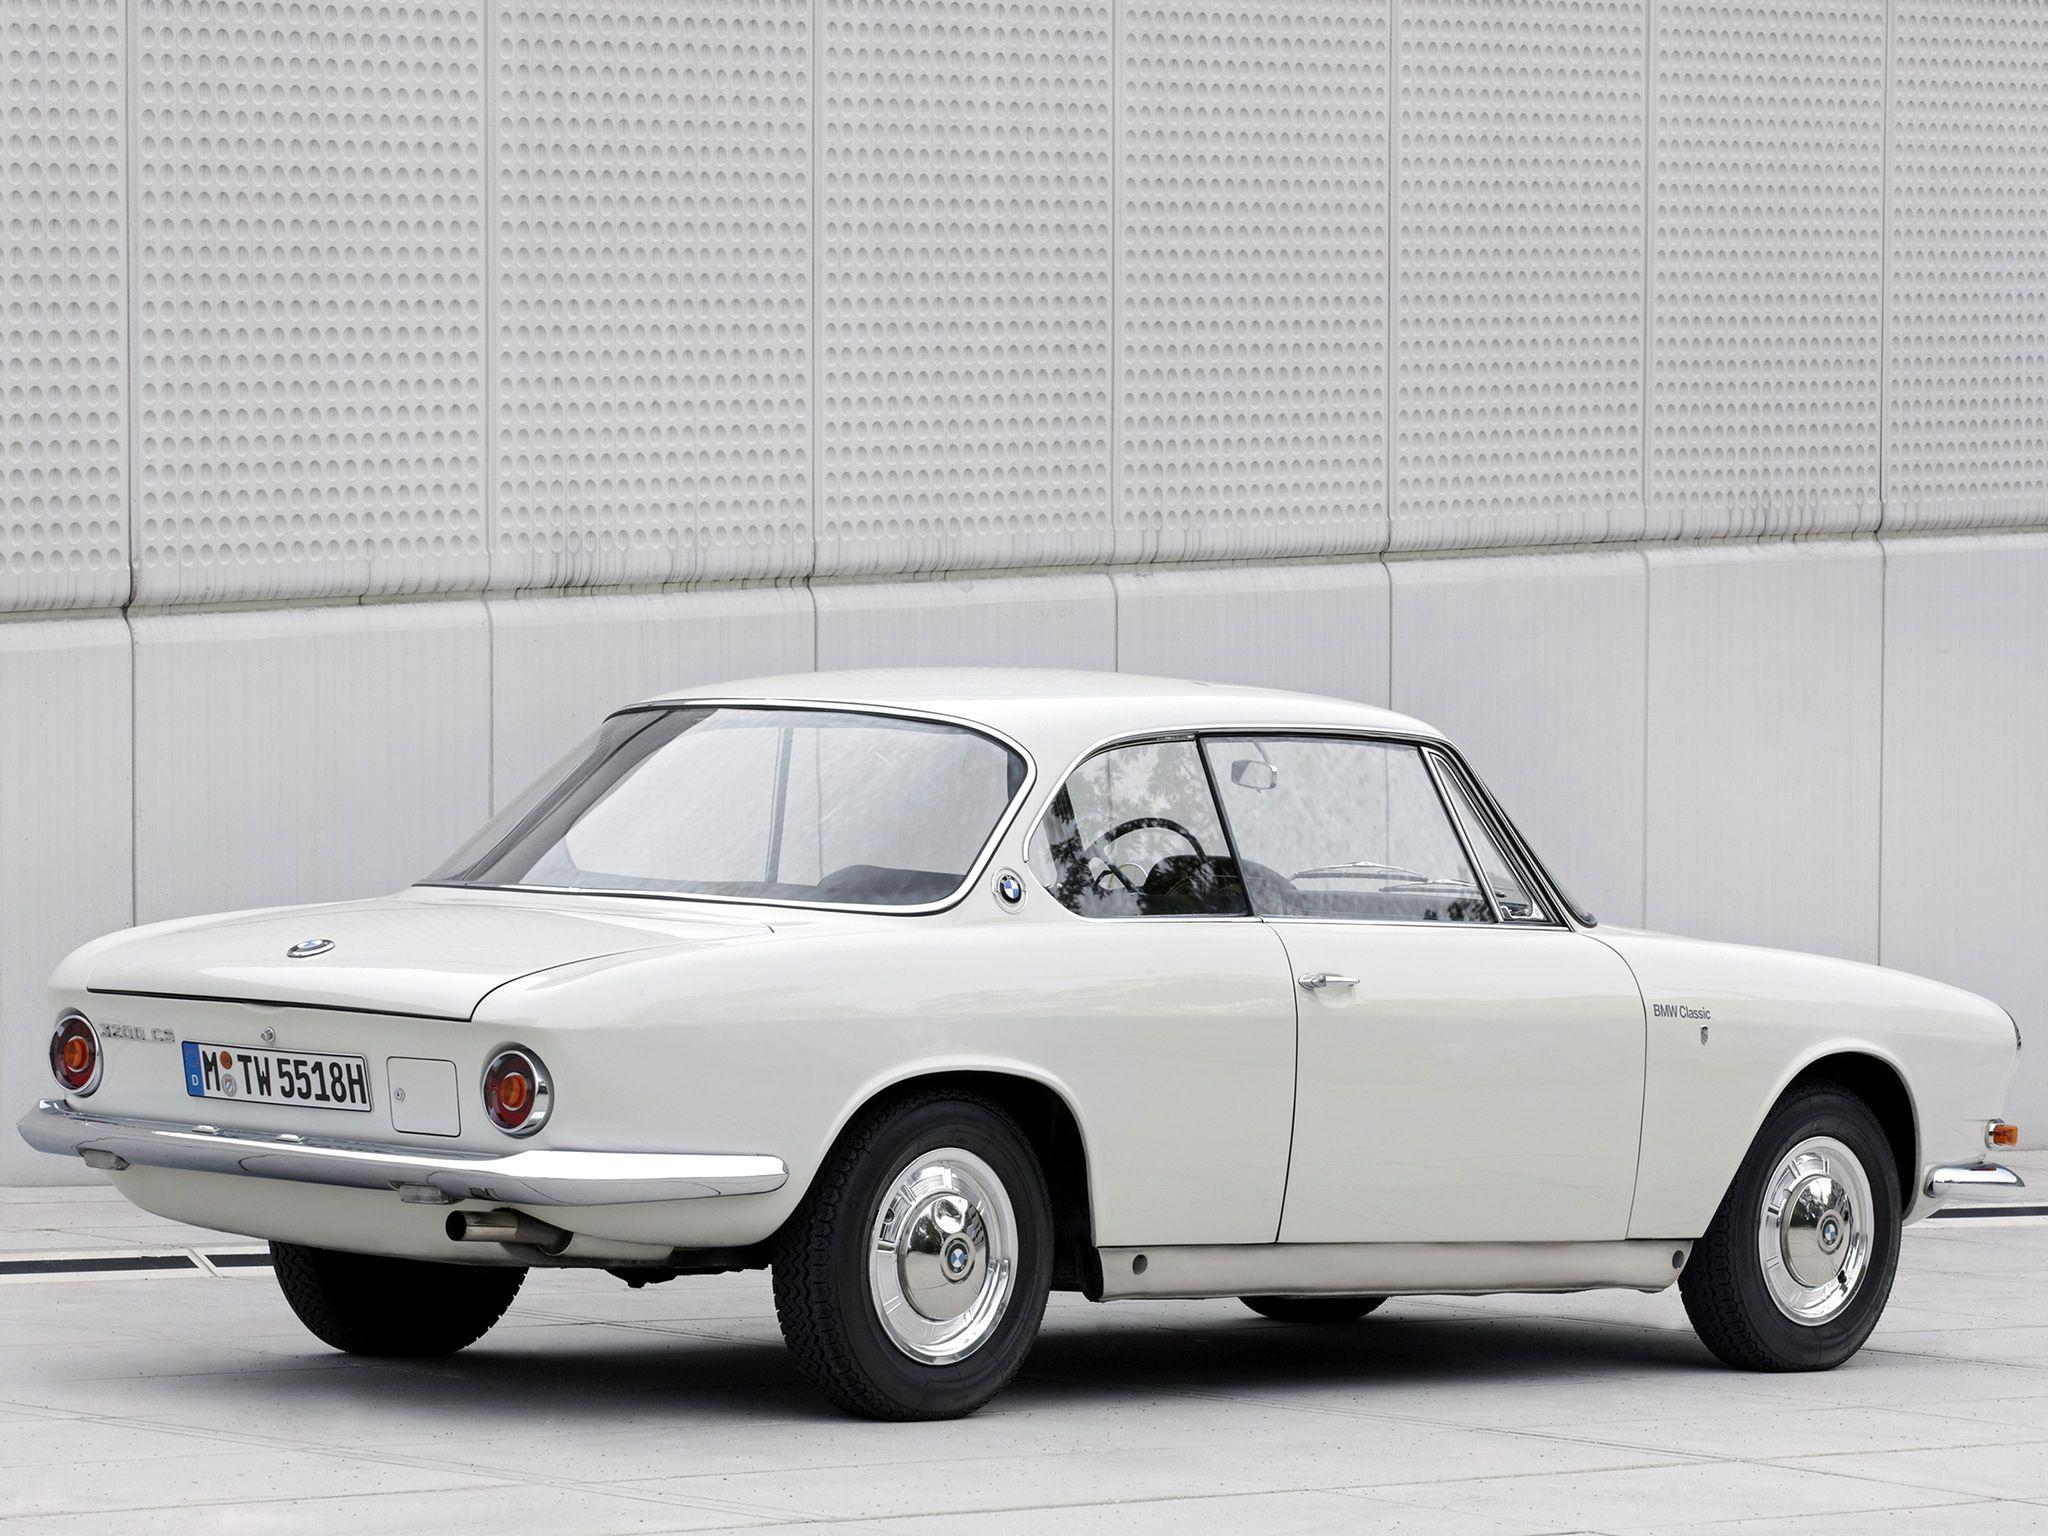 1962-65 BMW 3200 CS Coupe | Car | Pinterest | BMW, Cars and Car stuff